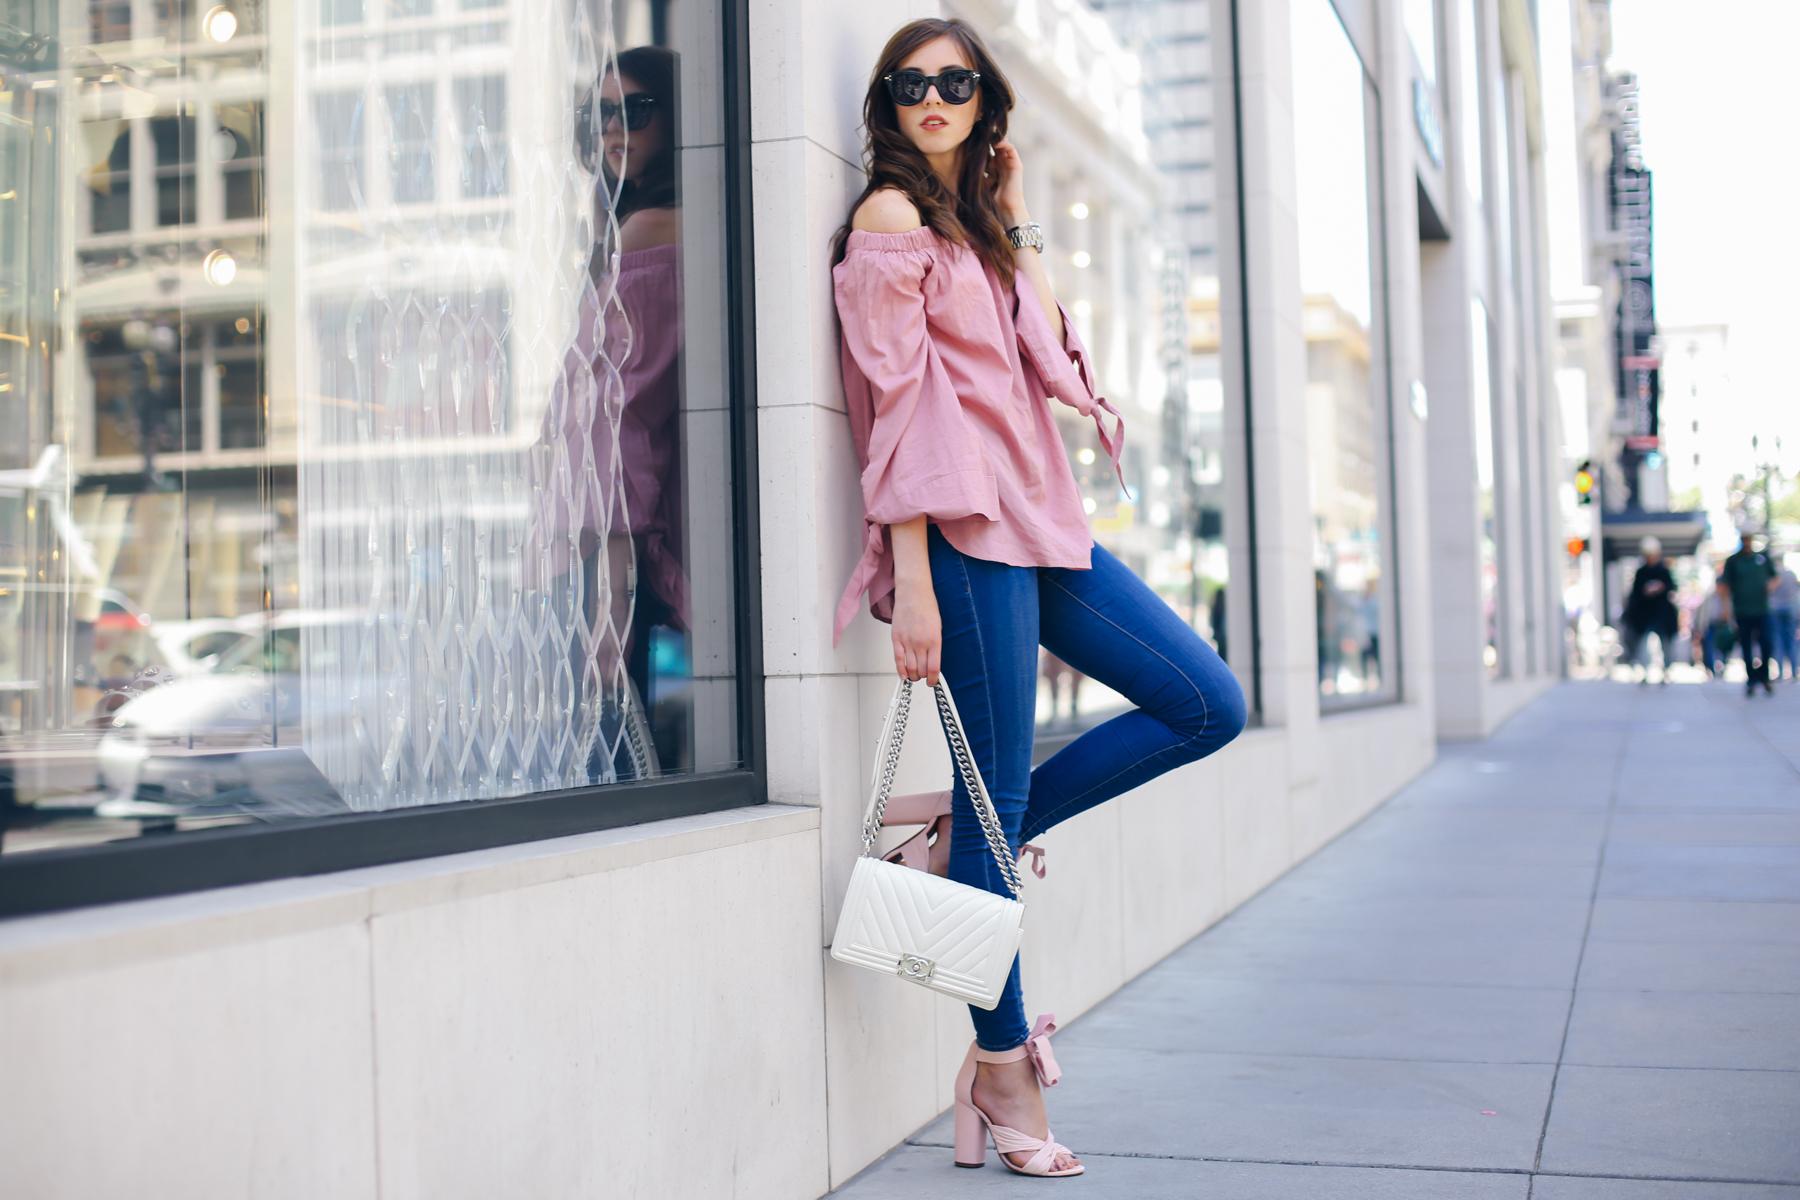 Barbora-Ondracova-FashioninmySoul-Fashion-Blogger-Photography-RyanbyRyanChua-7379